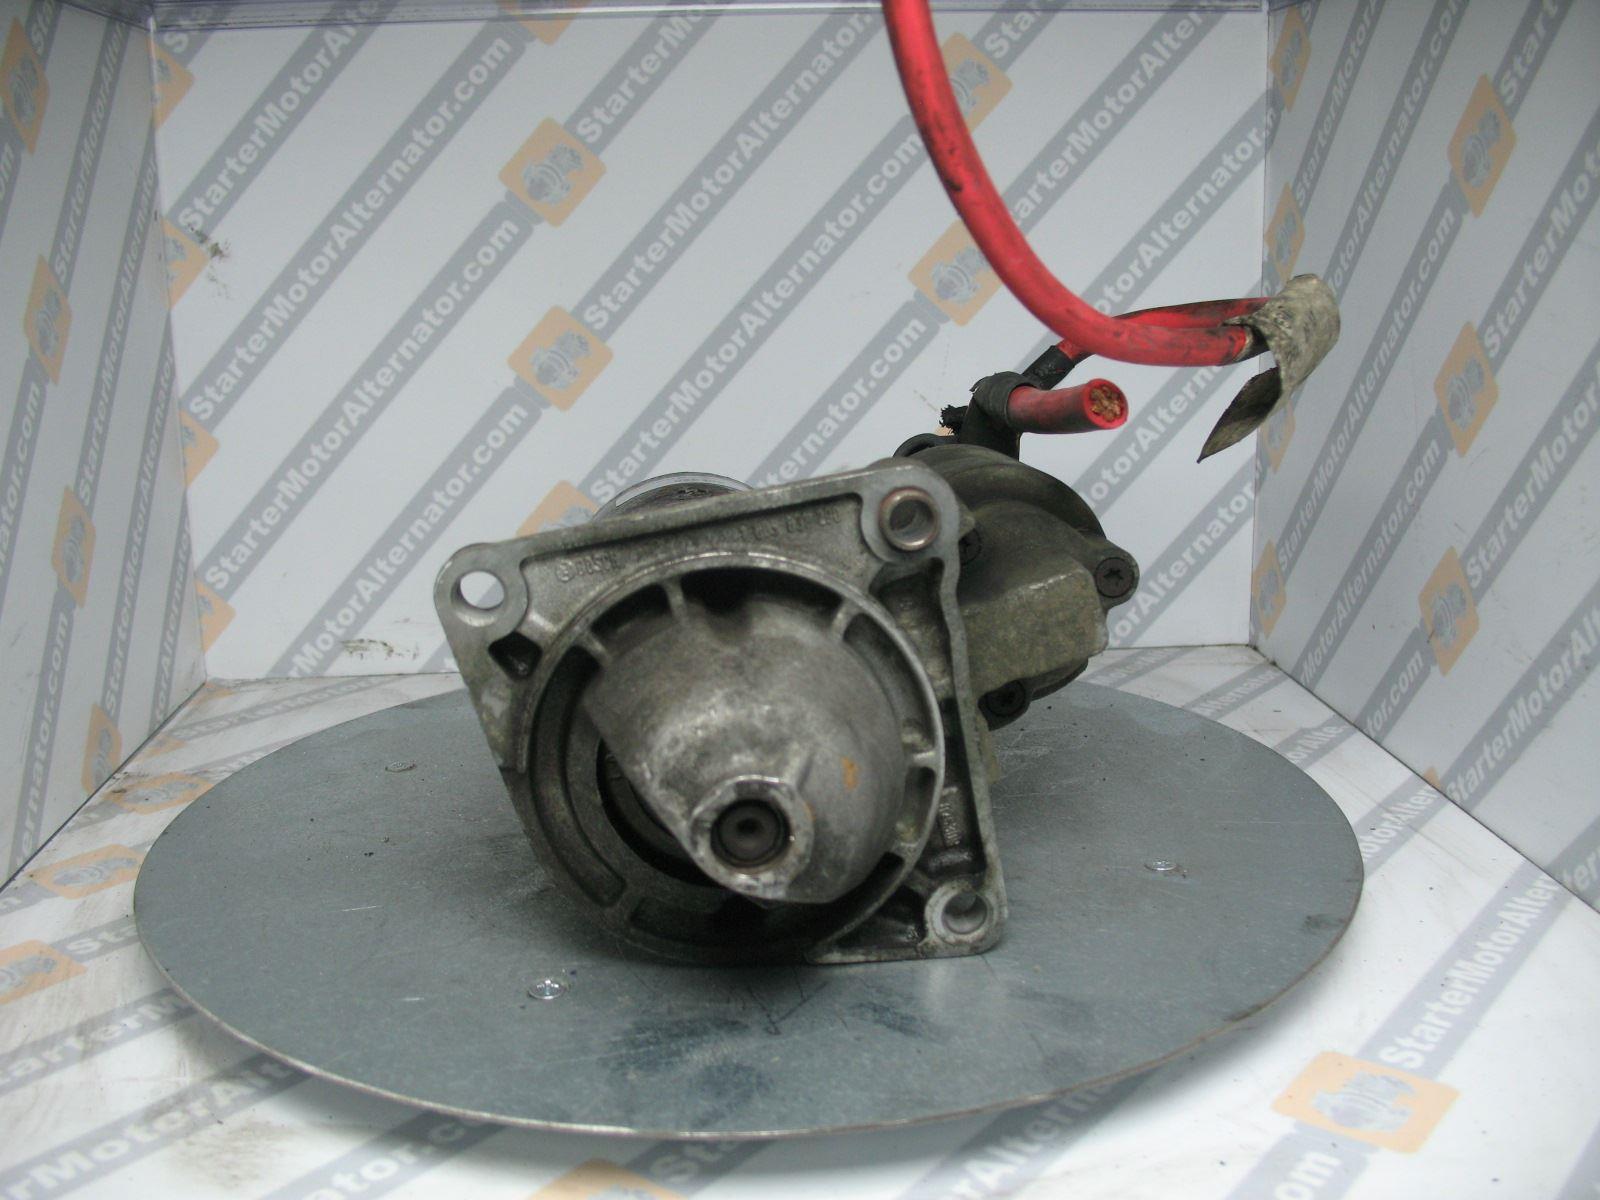 XIU1264 Starter Motor For Alfa Romeo / Chrysler / Fiat / Opel / Saab / Vauxhall